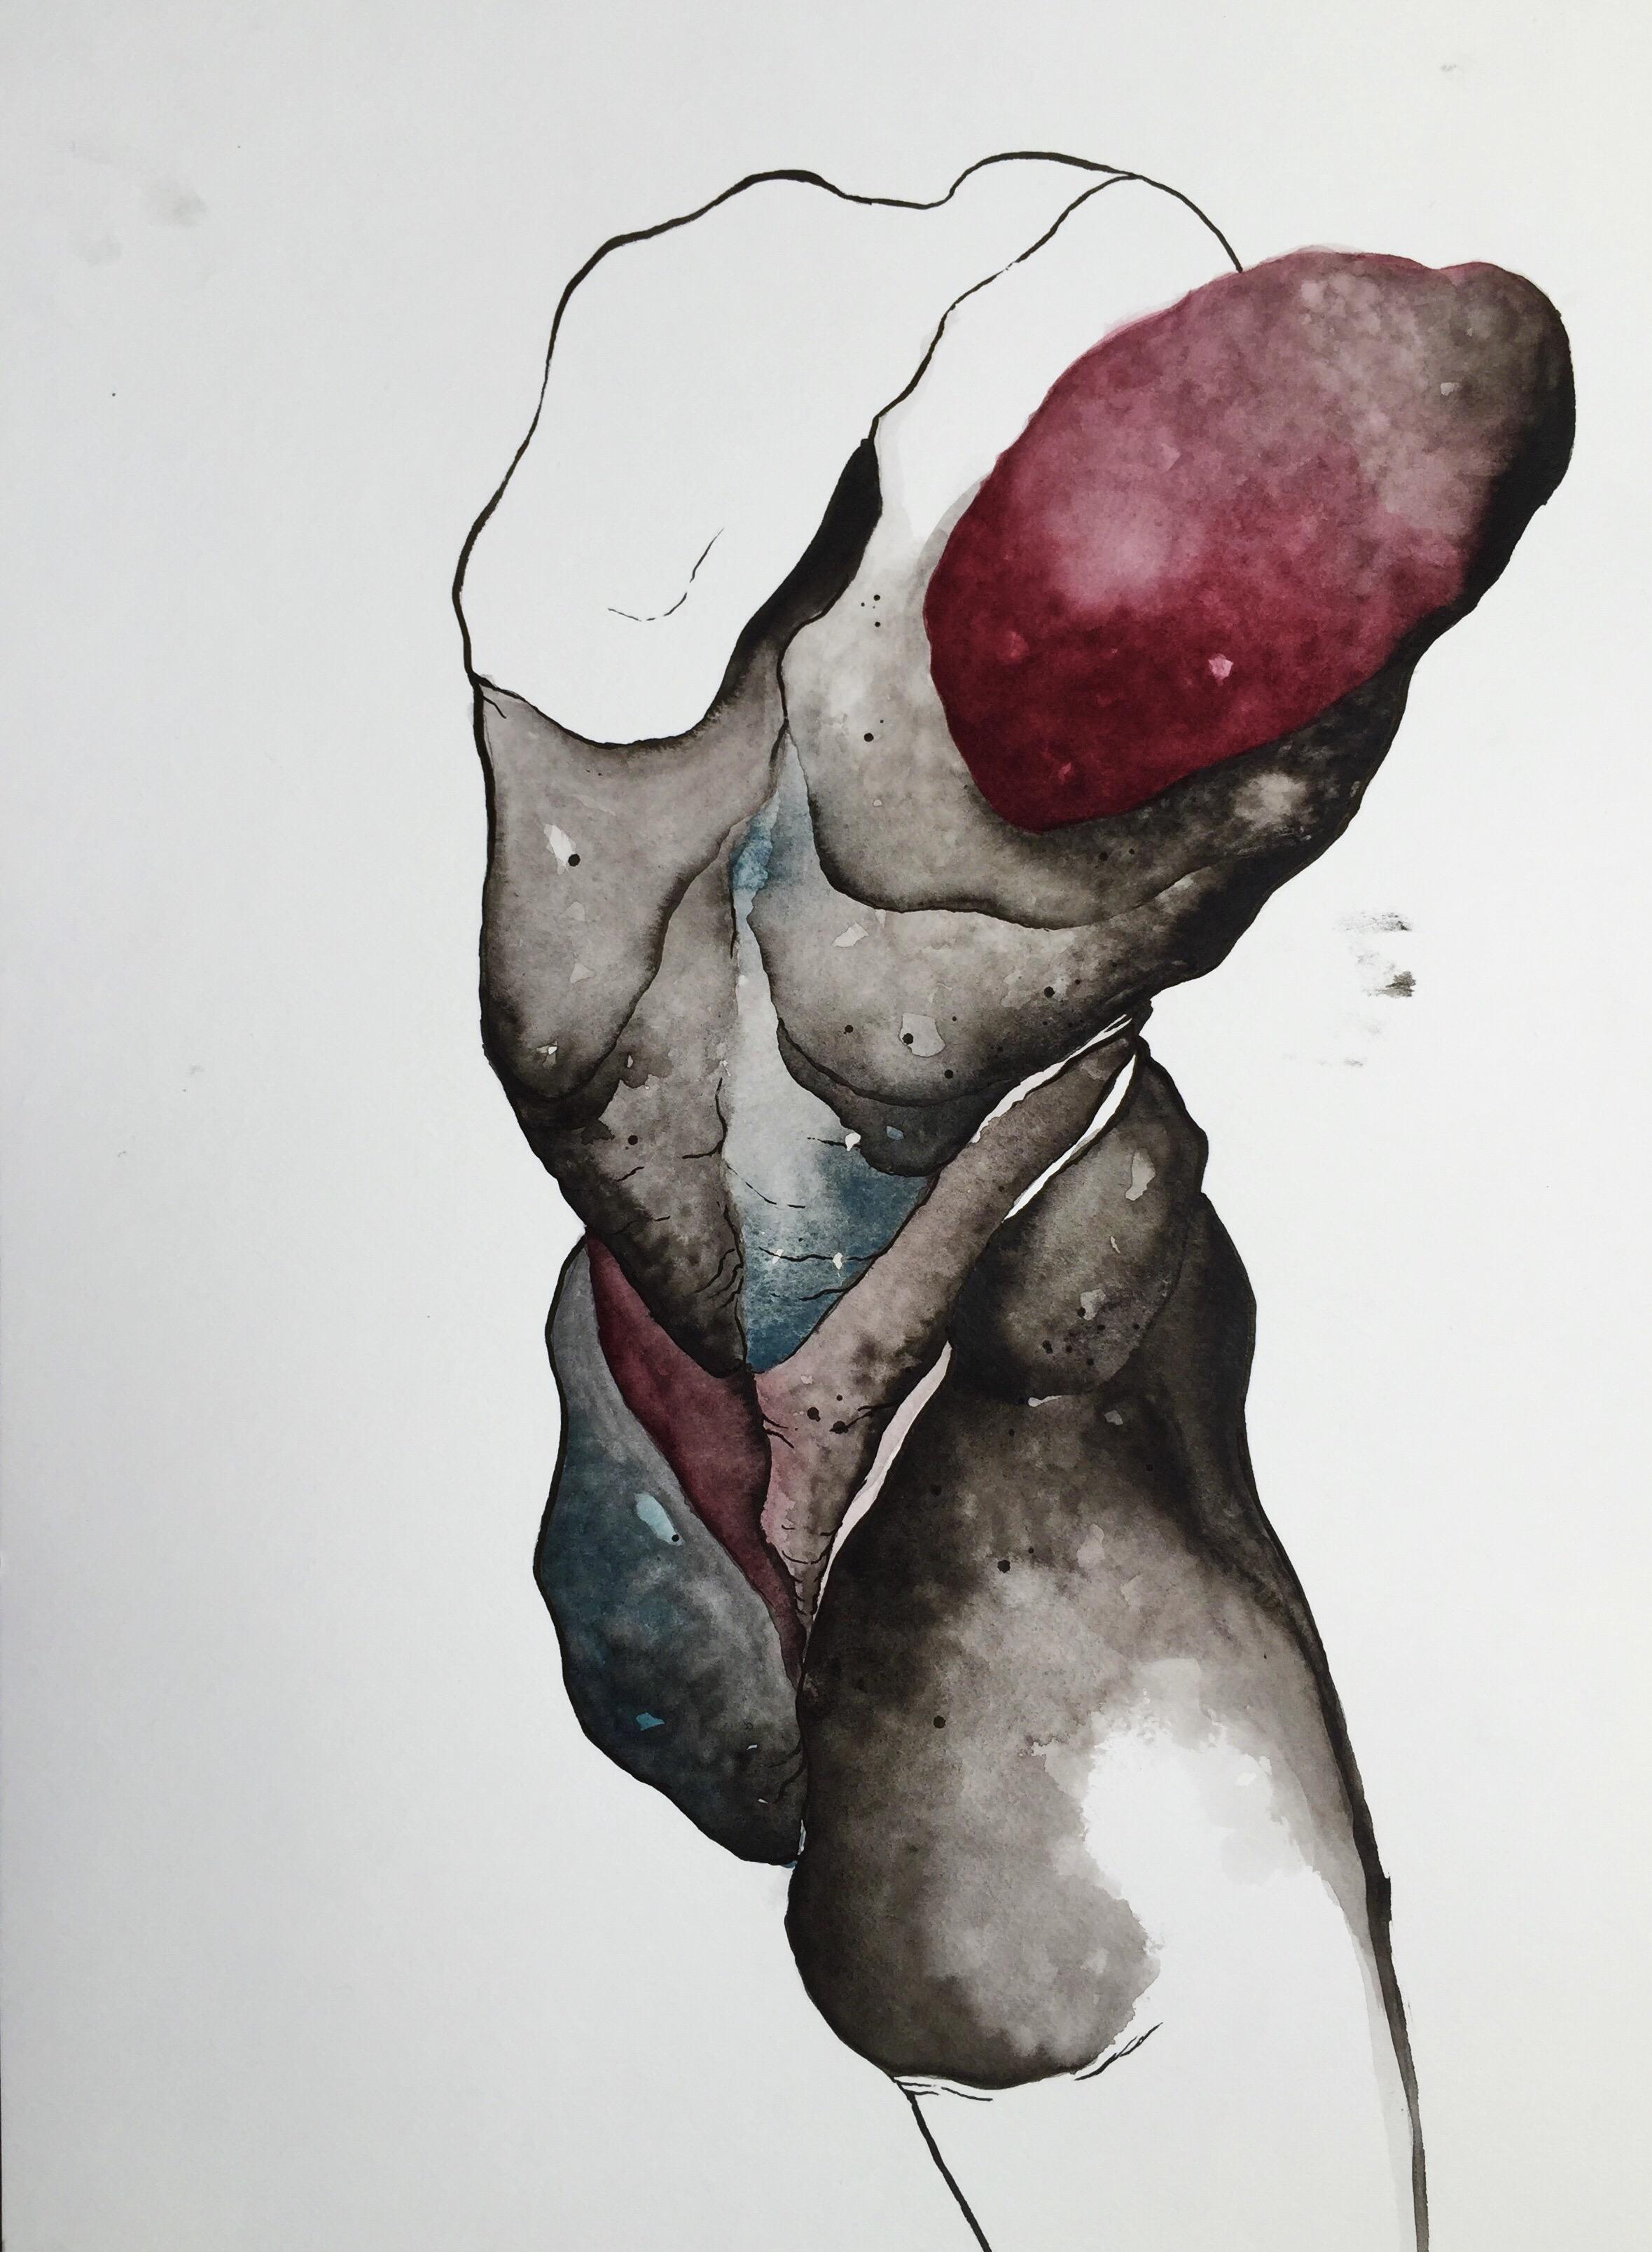 1544460531707-Daniel-Crook-Painting-5